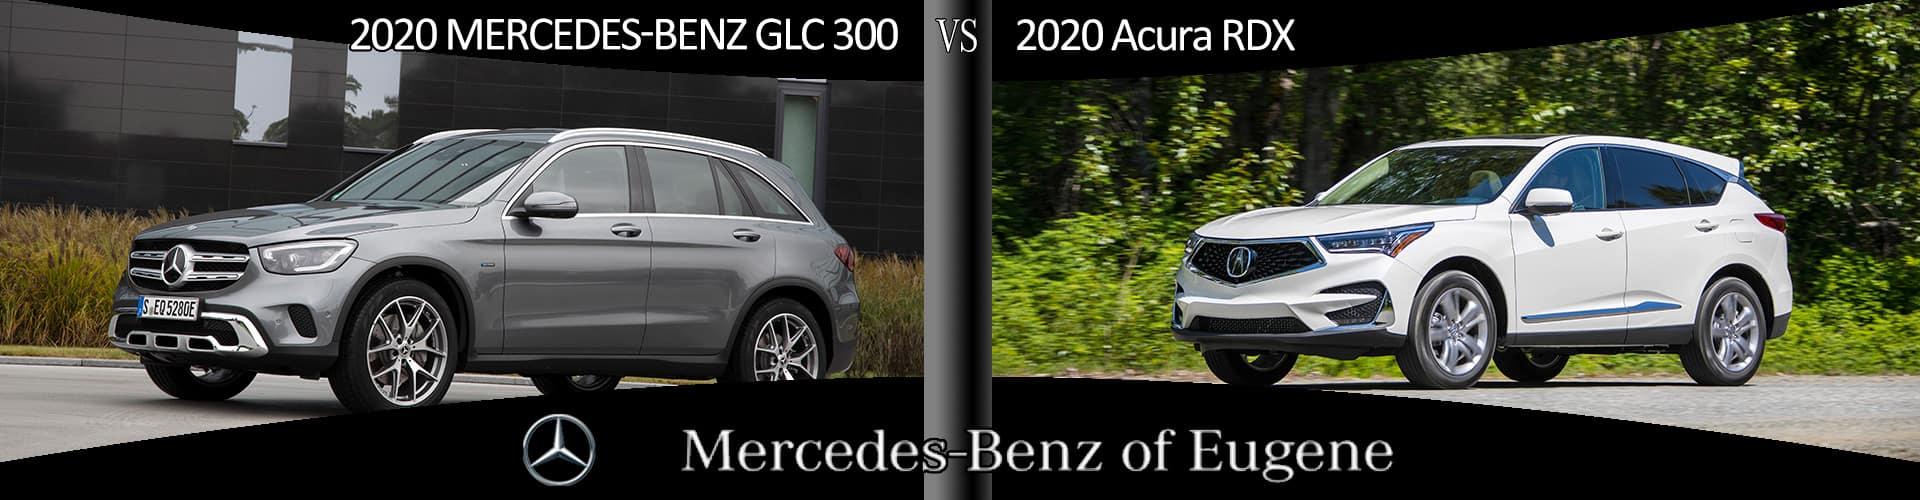 Mercedes-Benz GLC vs. Acura RDX